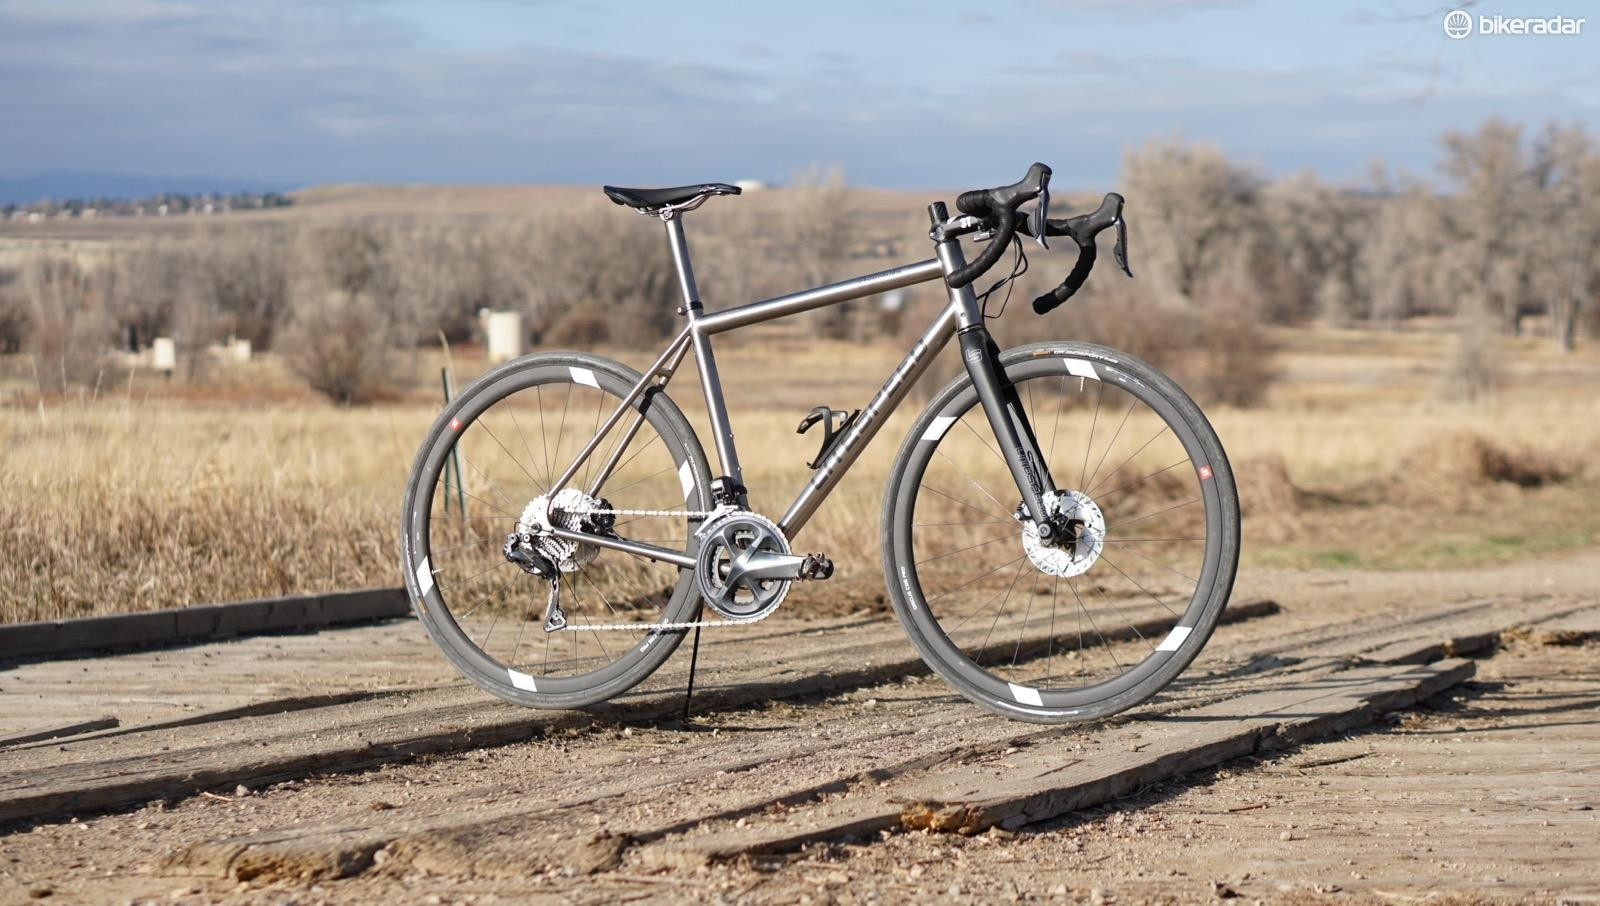 Litespeed Cherohala SE review - Gravel Bikes - Bikes - BikeRadar